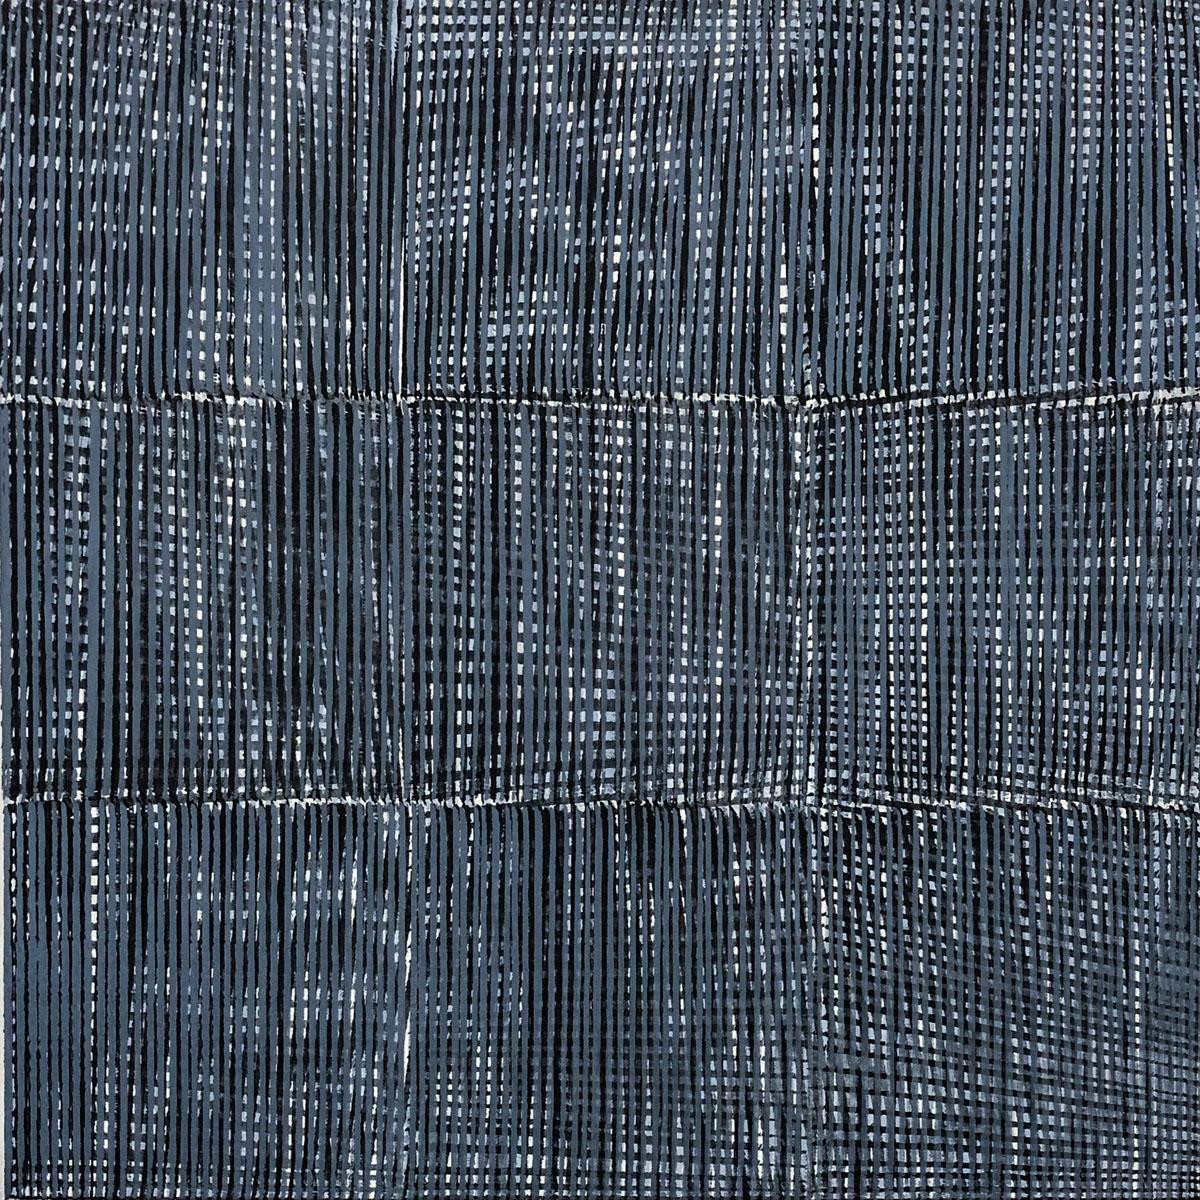 Nikola Dimitrov, Allegorie II/III 2013, Pigmente, Bindemittel auf Leinwand, 60 × 60 cm